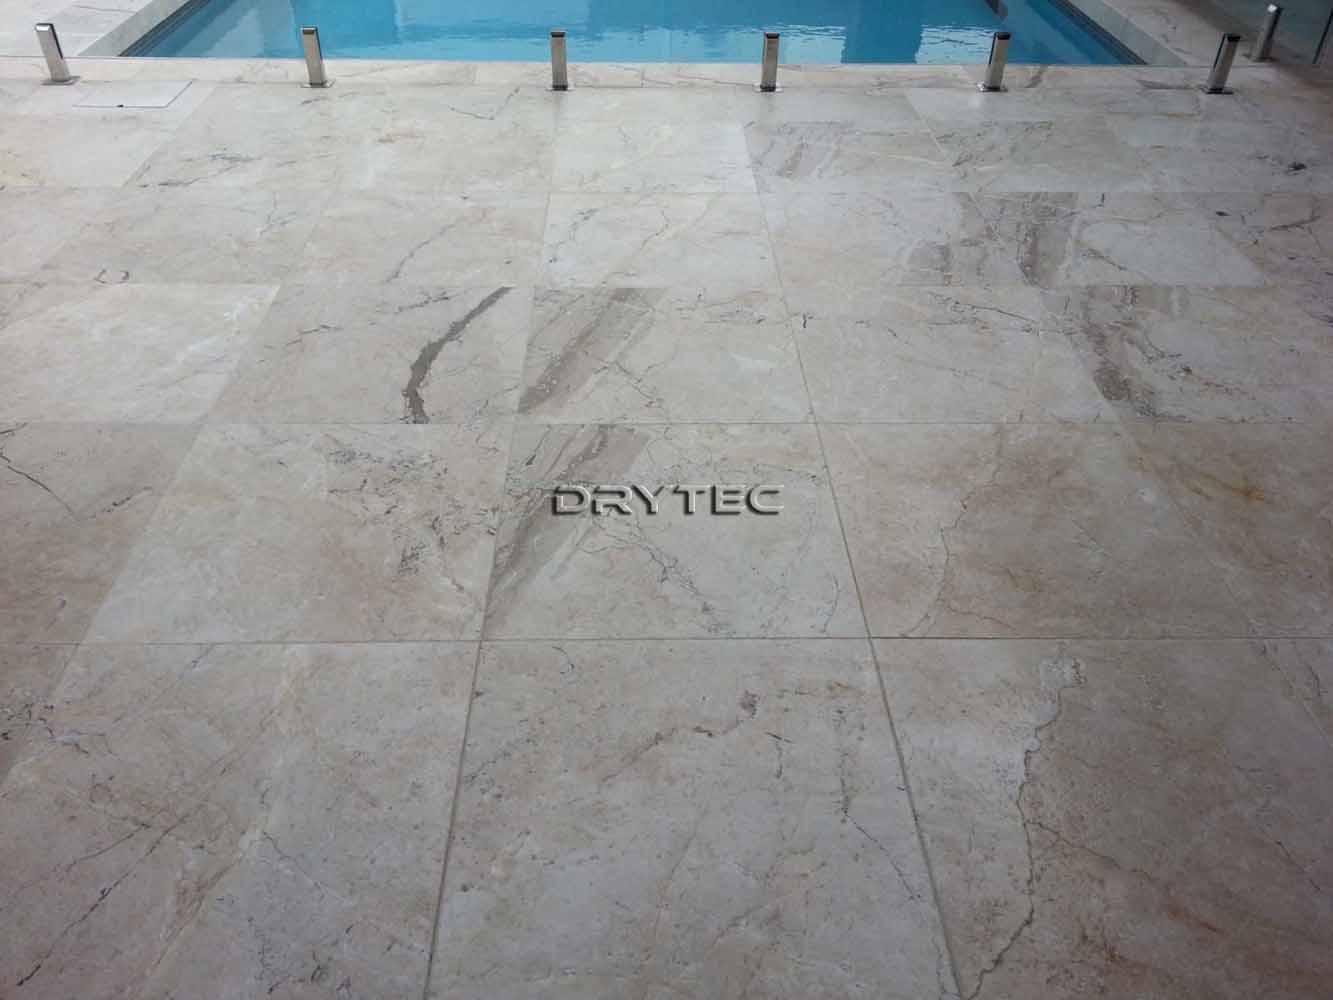 Natural Stone Floor Restoration - Polishing - Grinding - Honing - Cleaning & Sealing